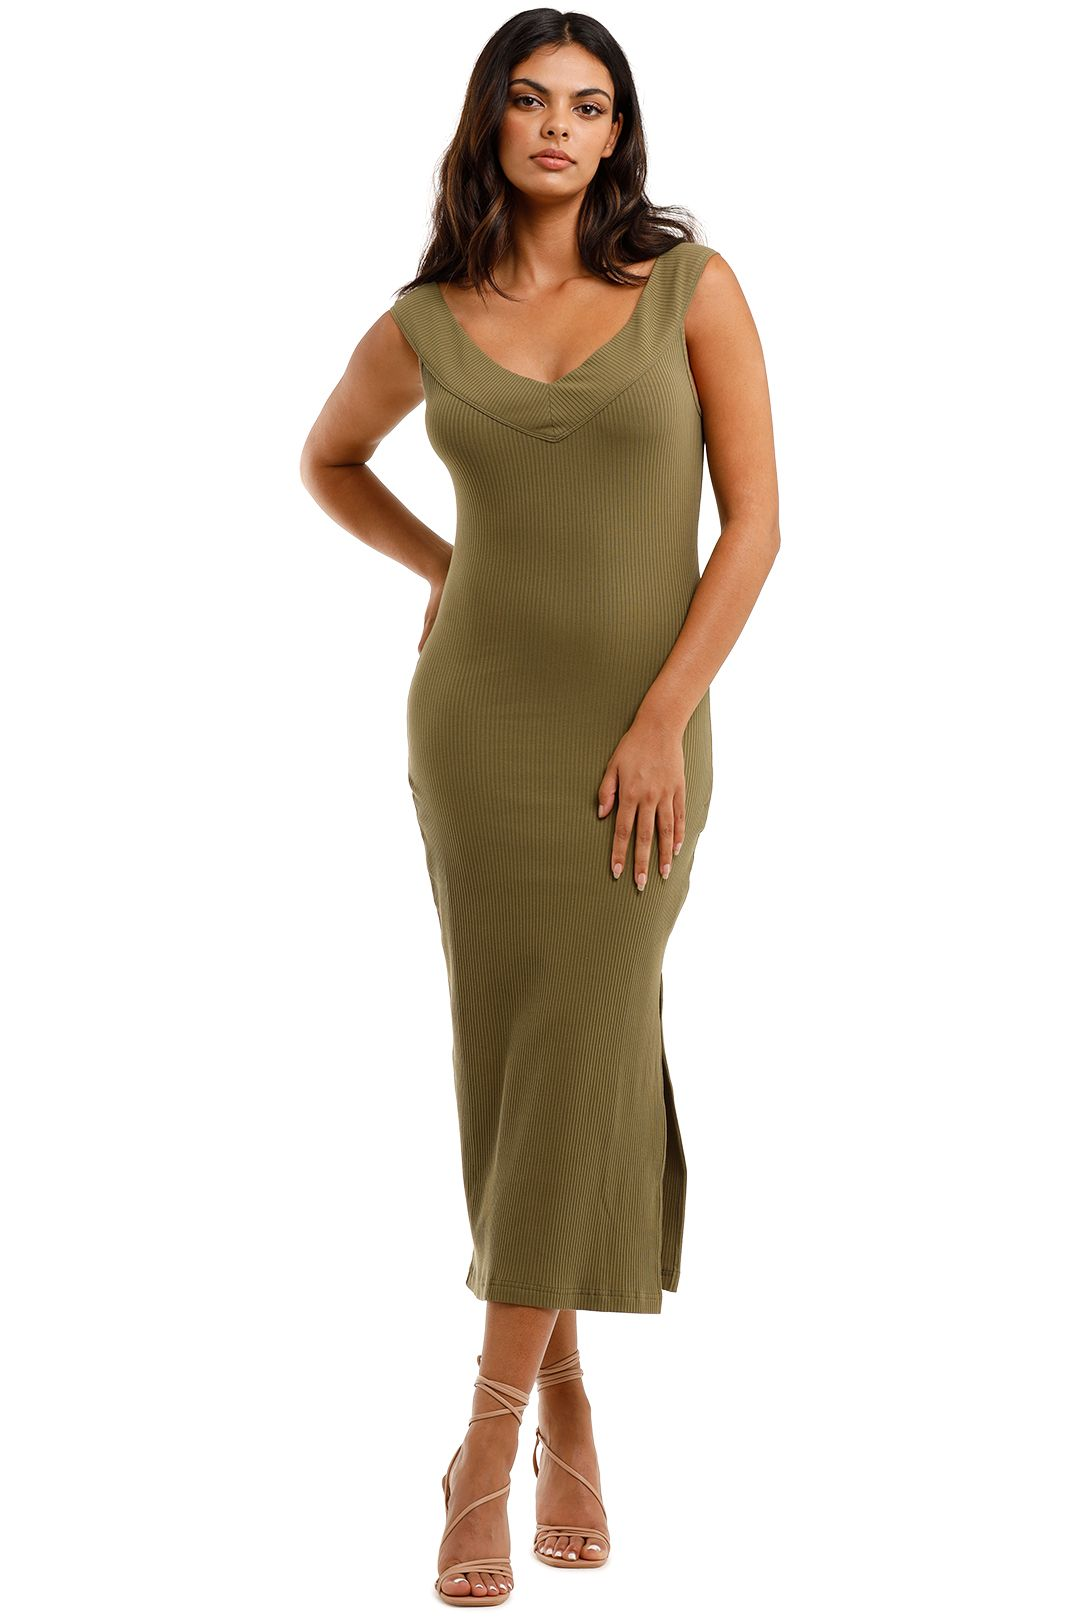 Spell Mazzy Ribbed Dress